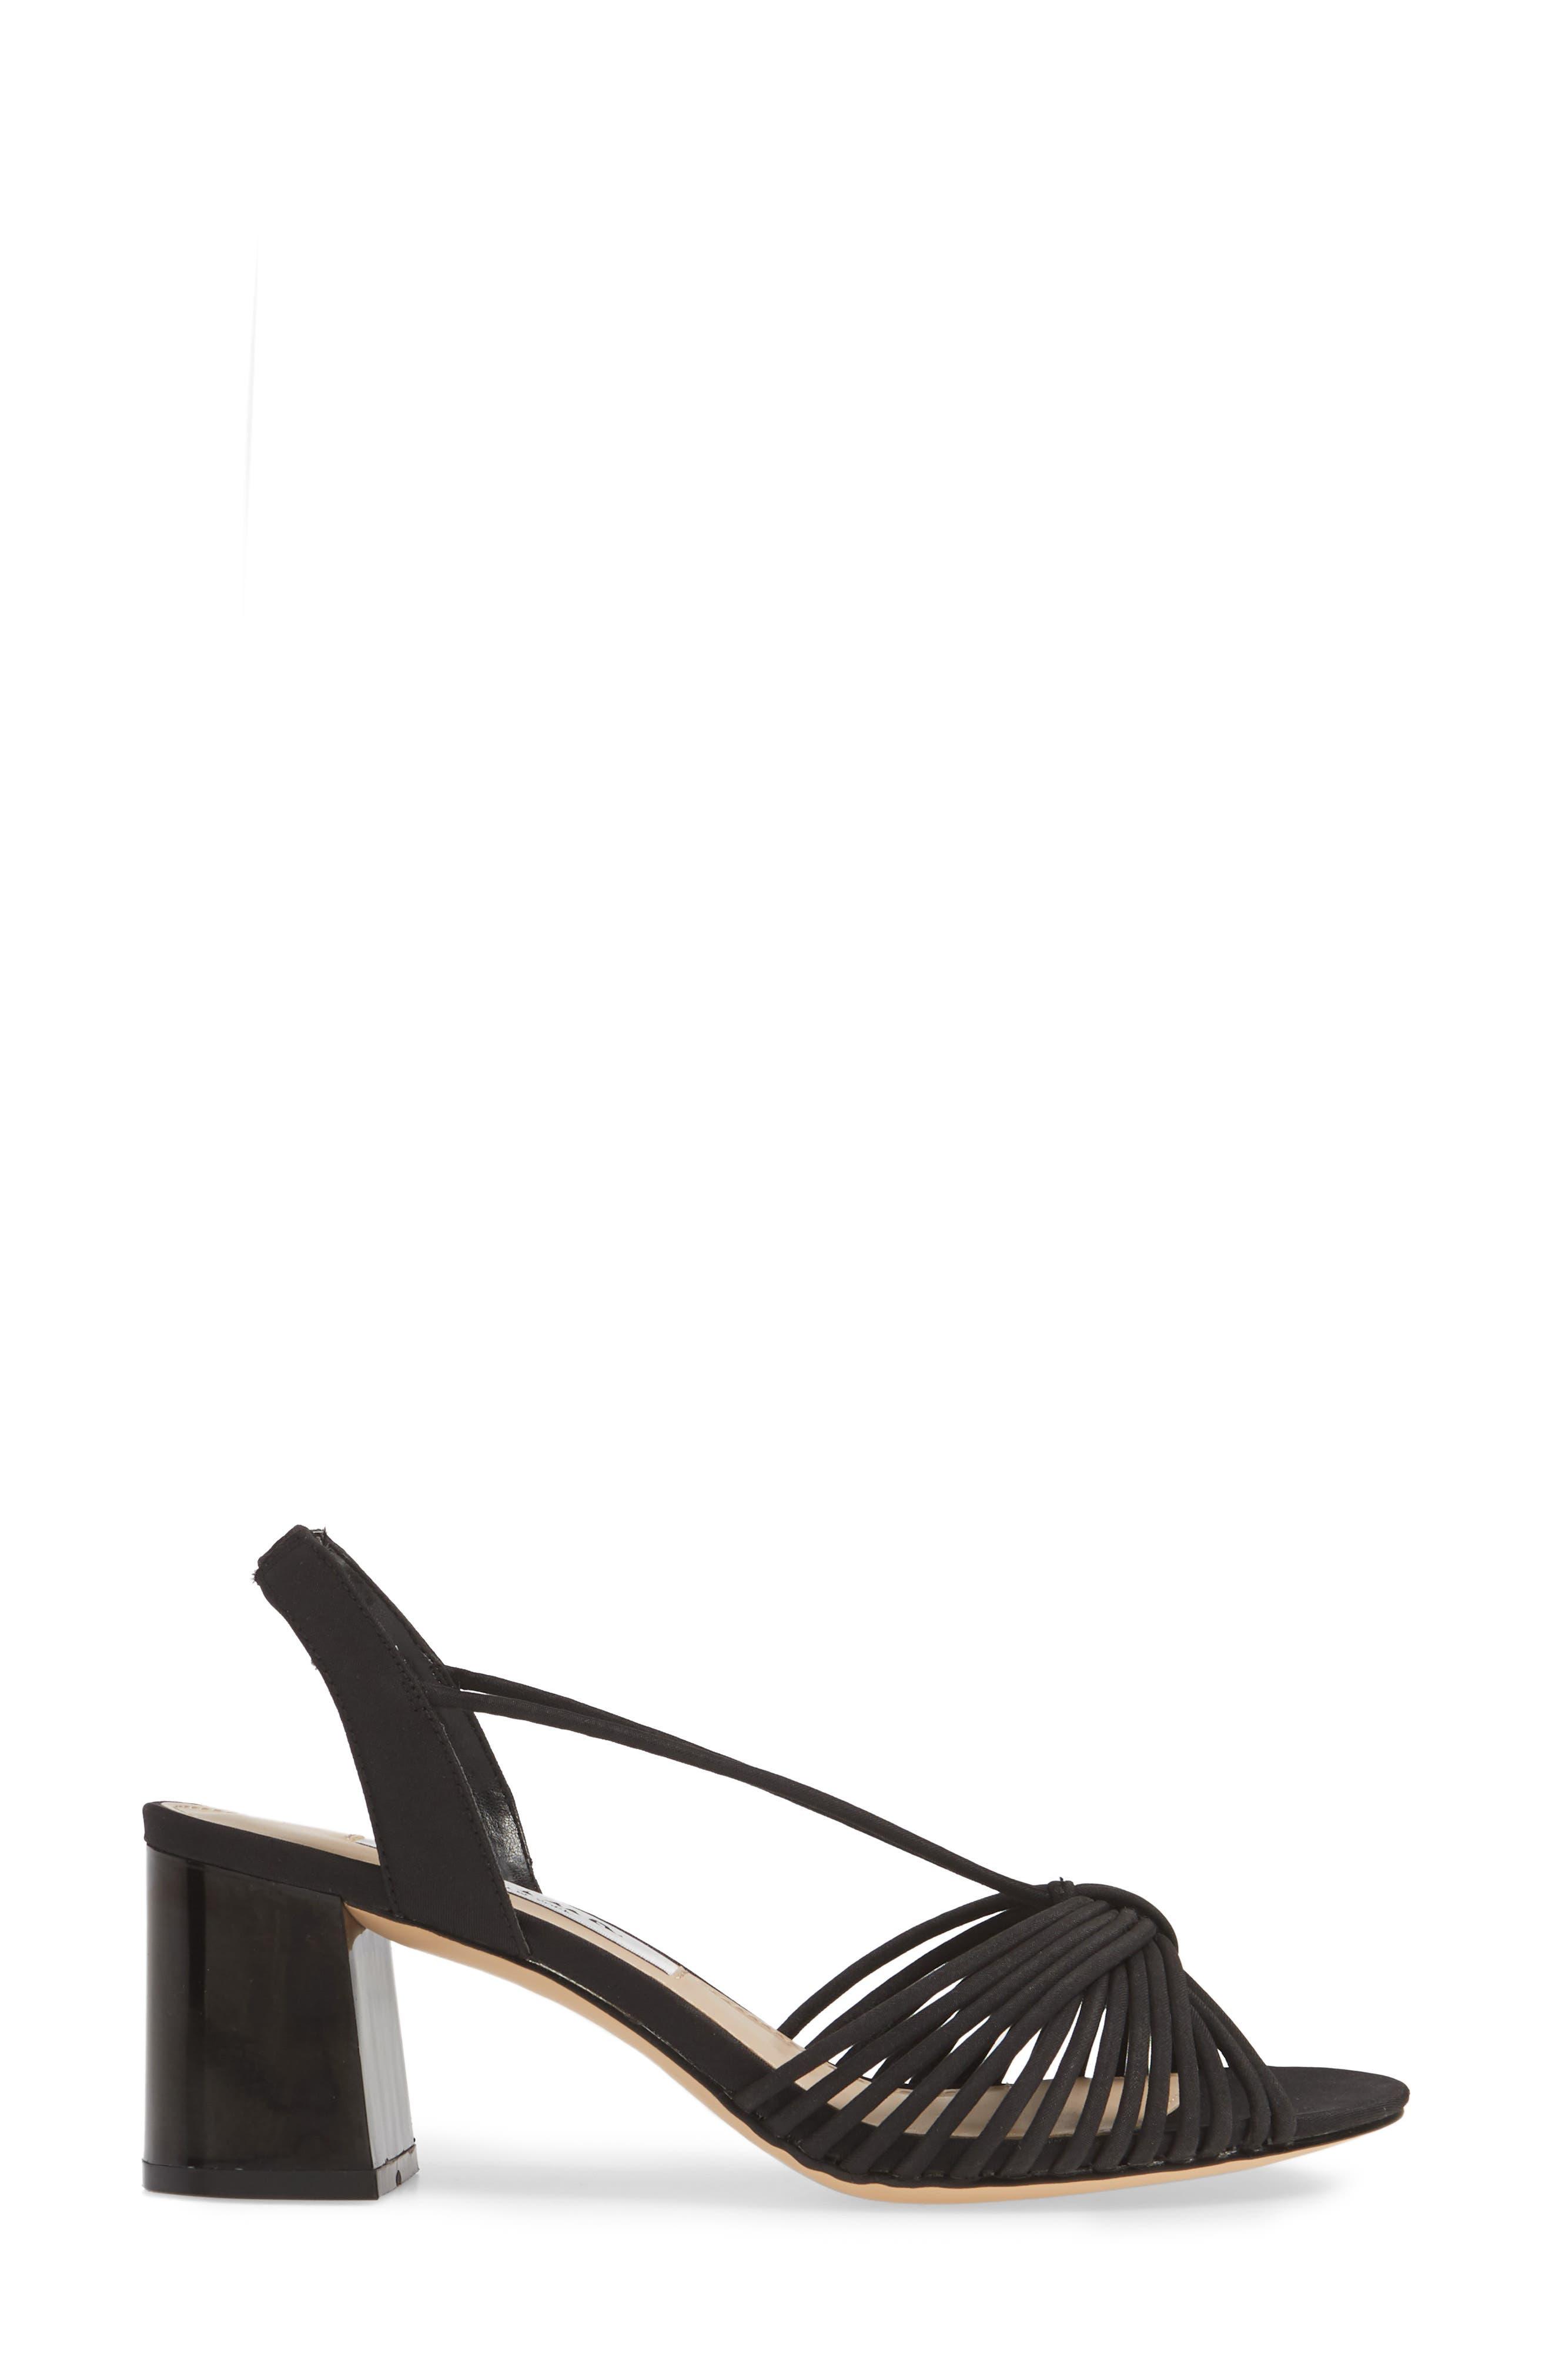 NINA, Nadelyn Strappy Sandal, Alternate thumbnail 3, color, BLACK FABRIC